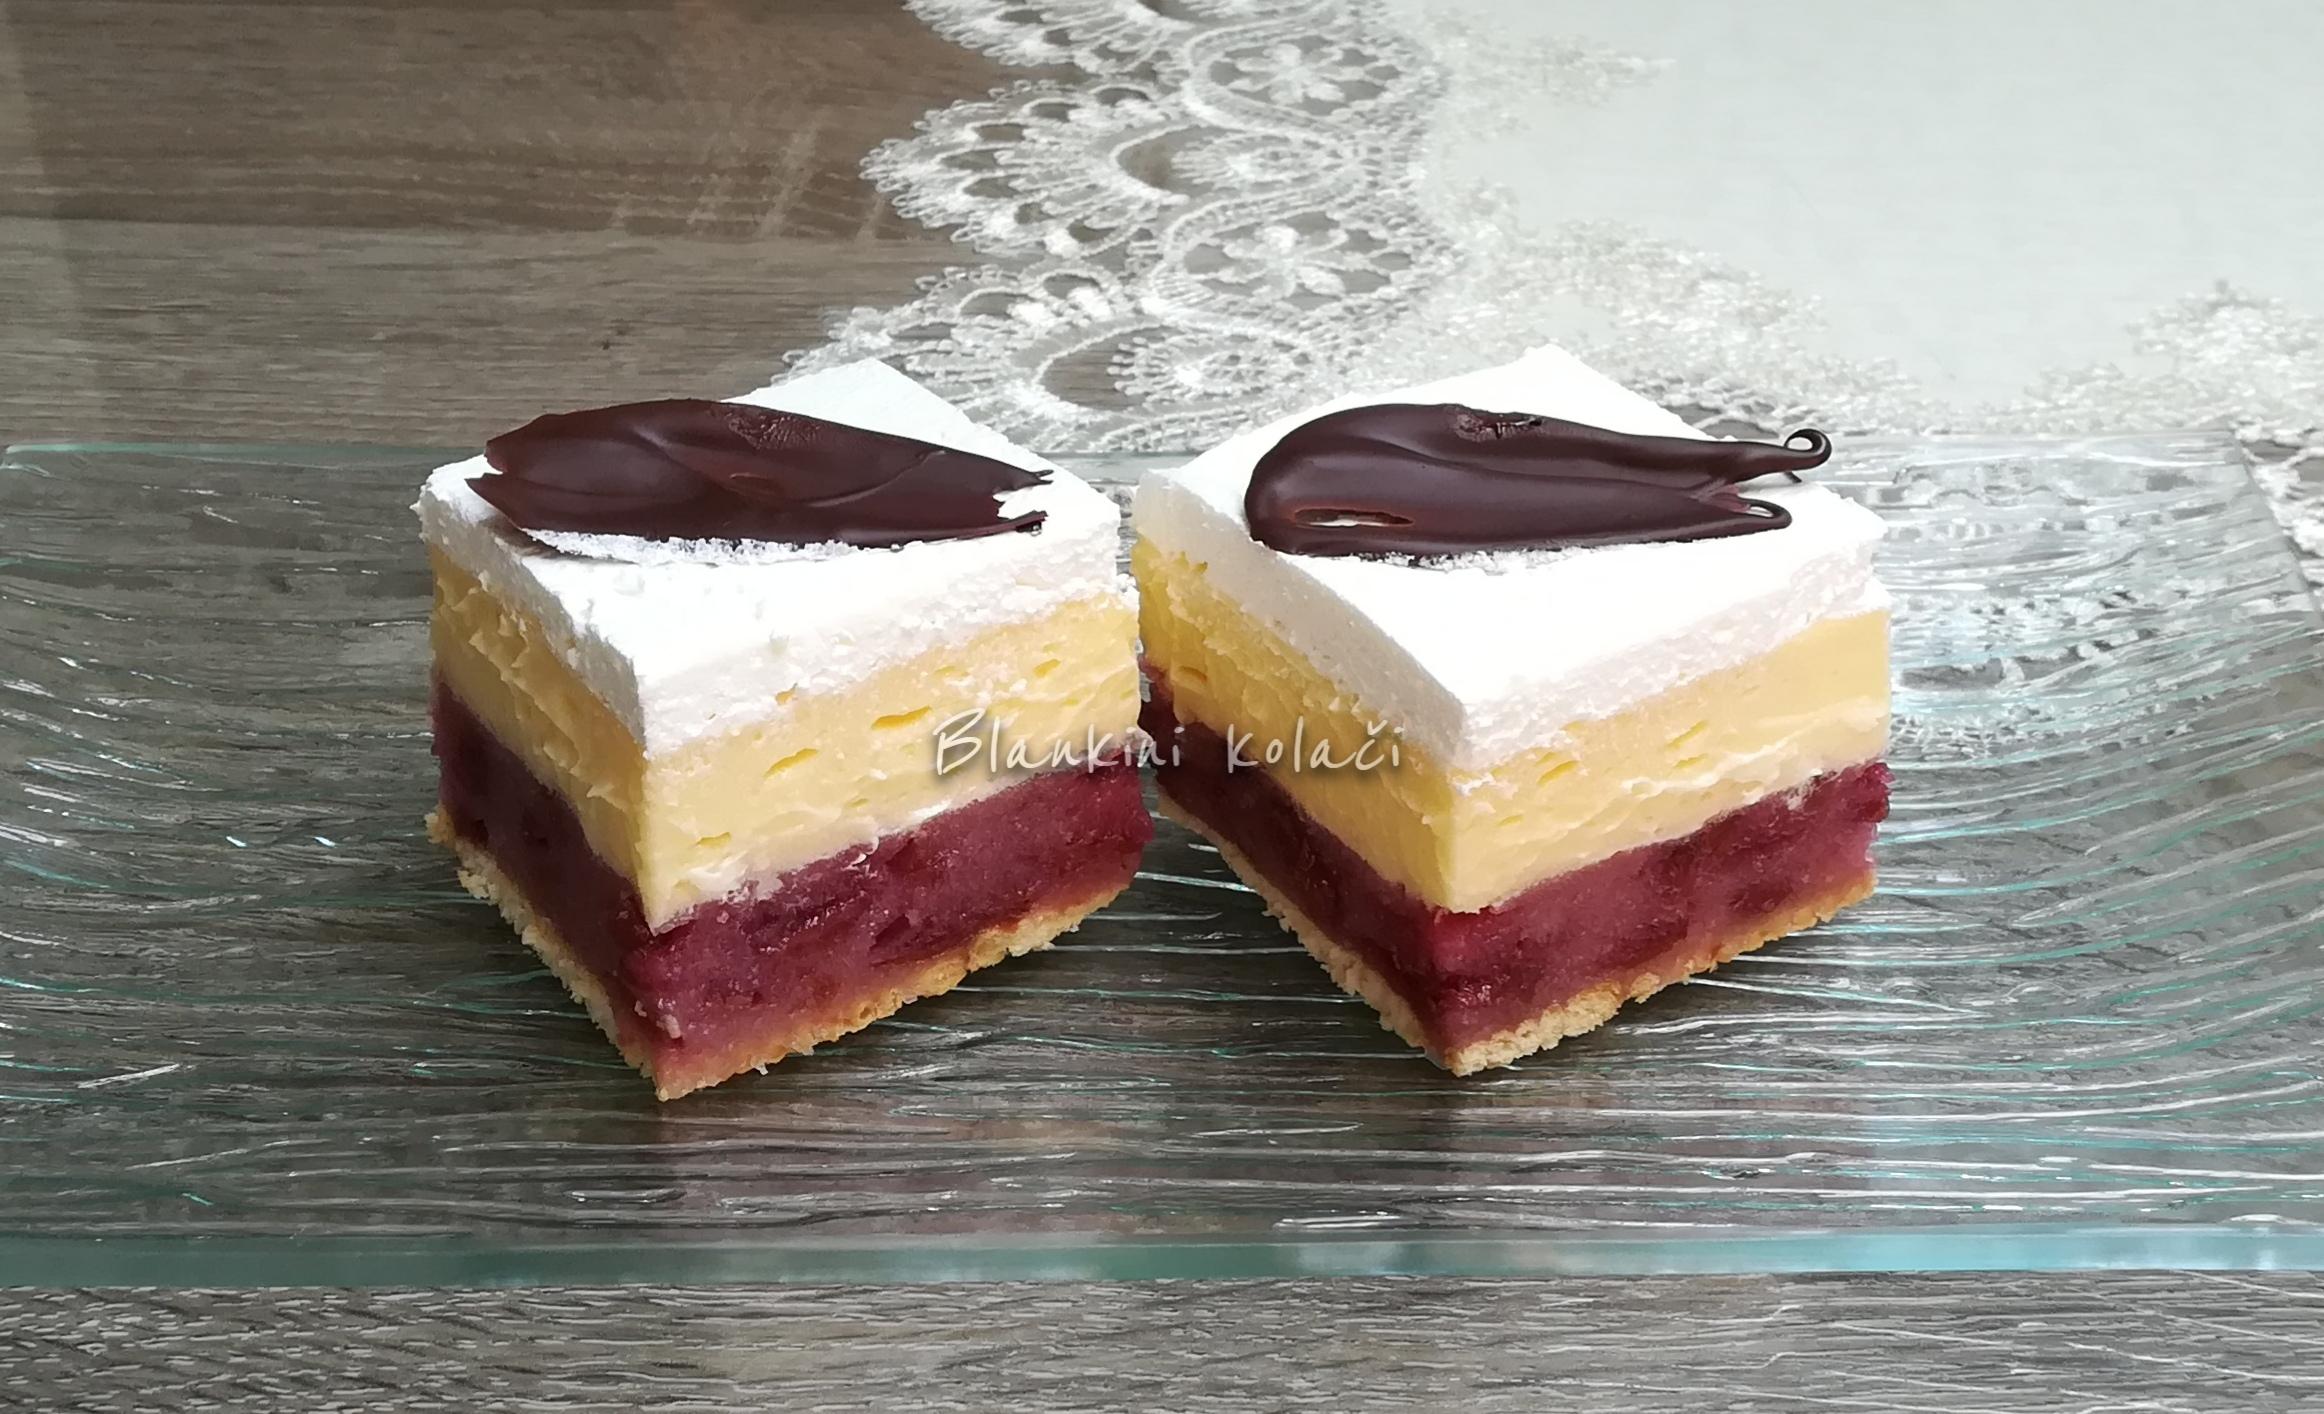 Martin kolač